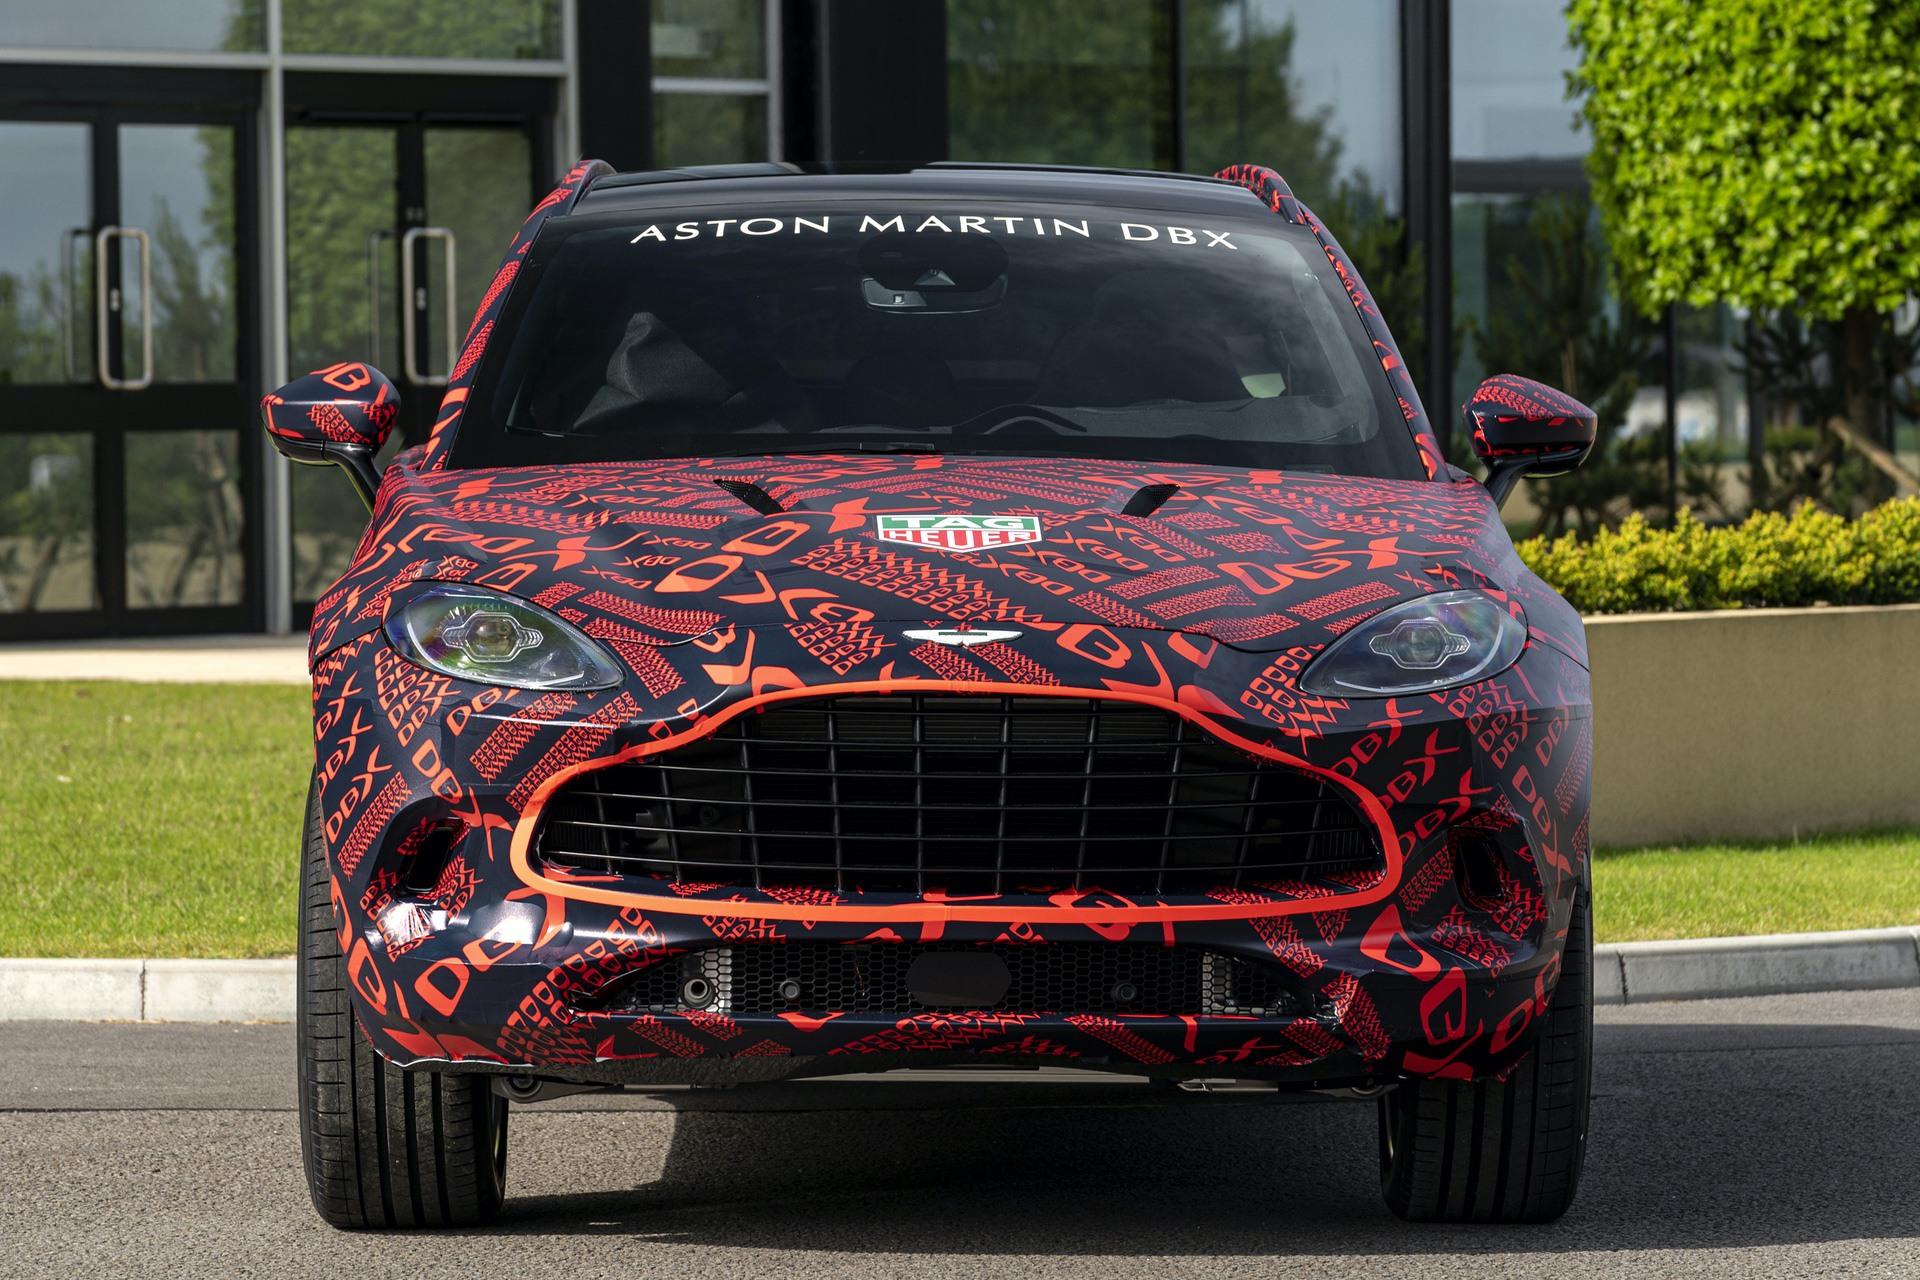 Aston-Martin-DBX_St-Athan_06